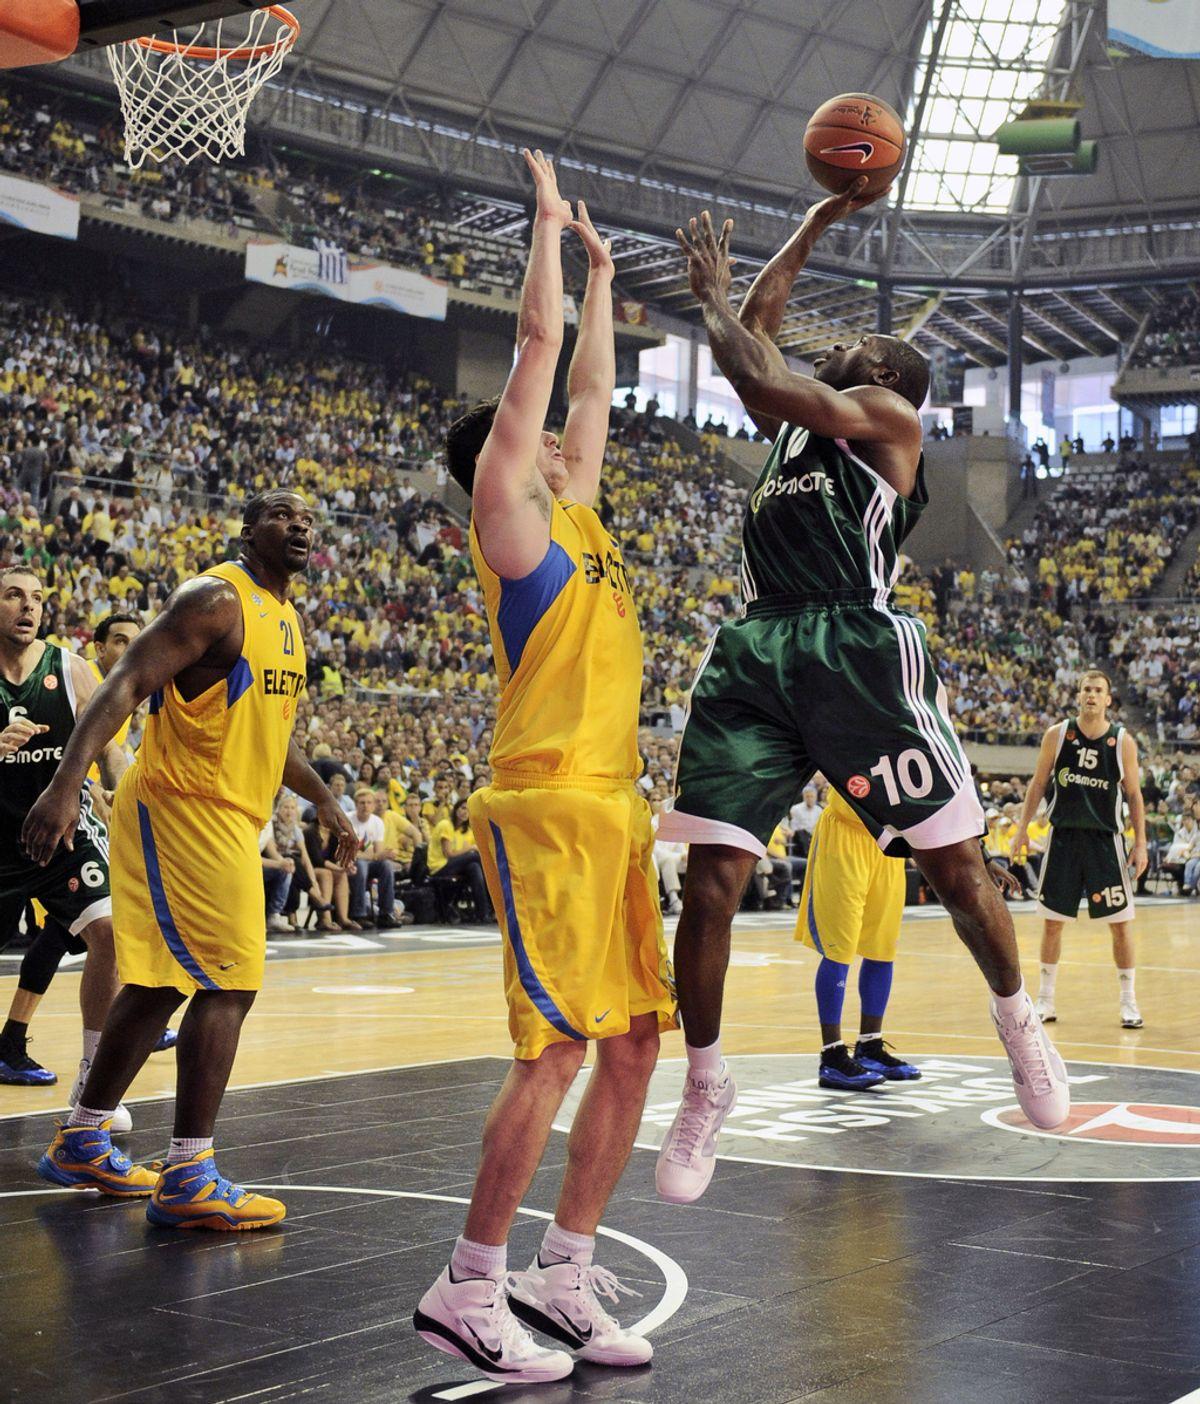 Maccabi, nazi, baloncesto